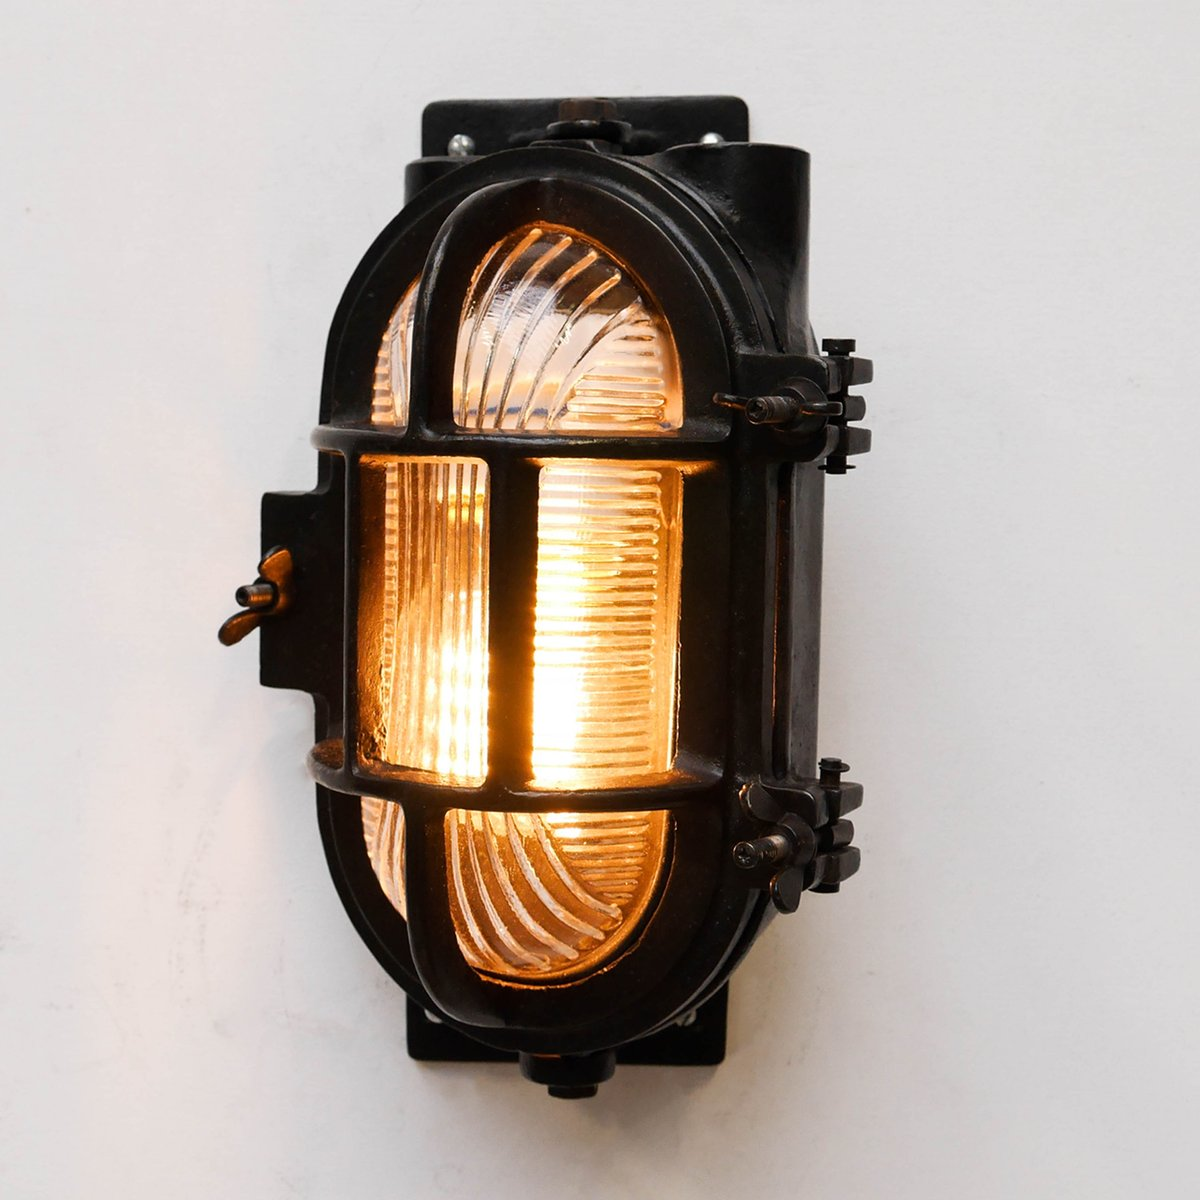 Drehbare vintage wandlampe bei pamono kaufen - Wandlampe vintage retro ...